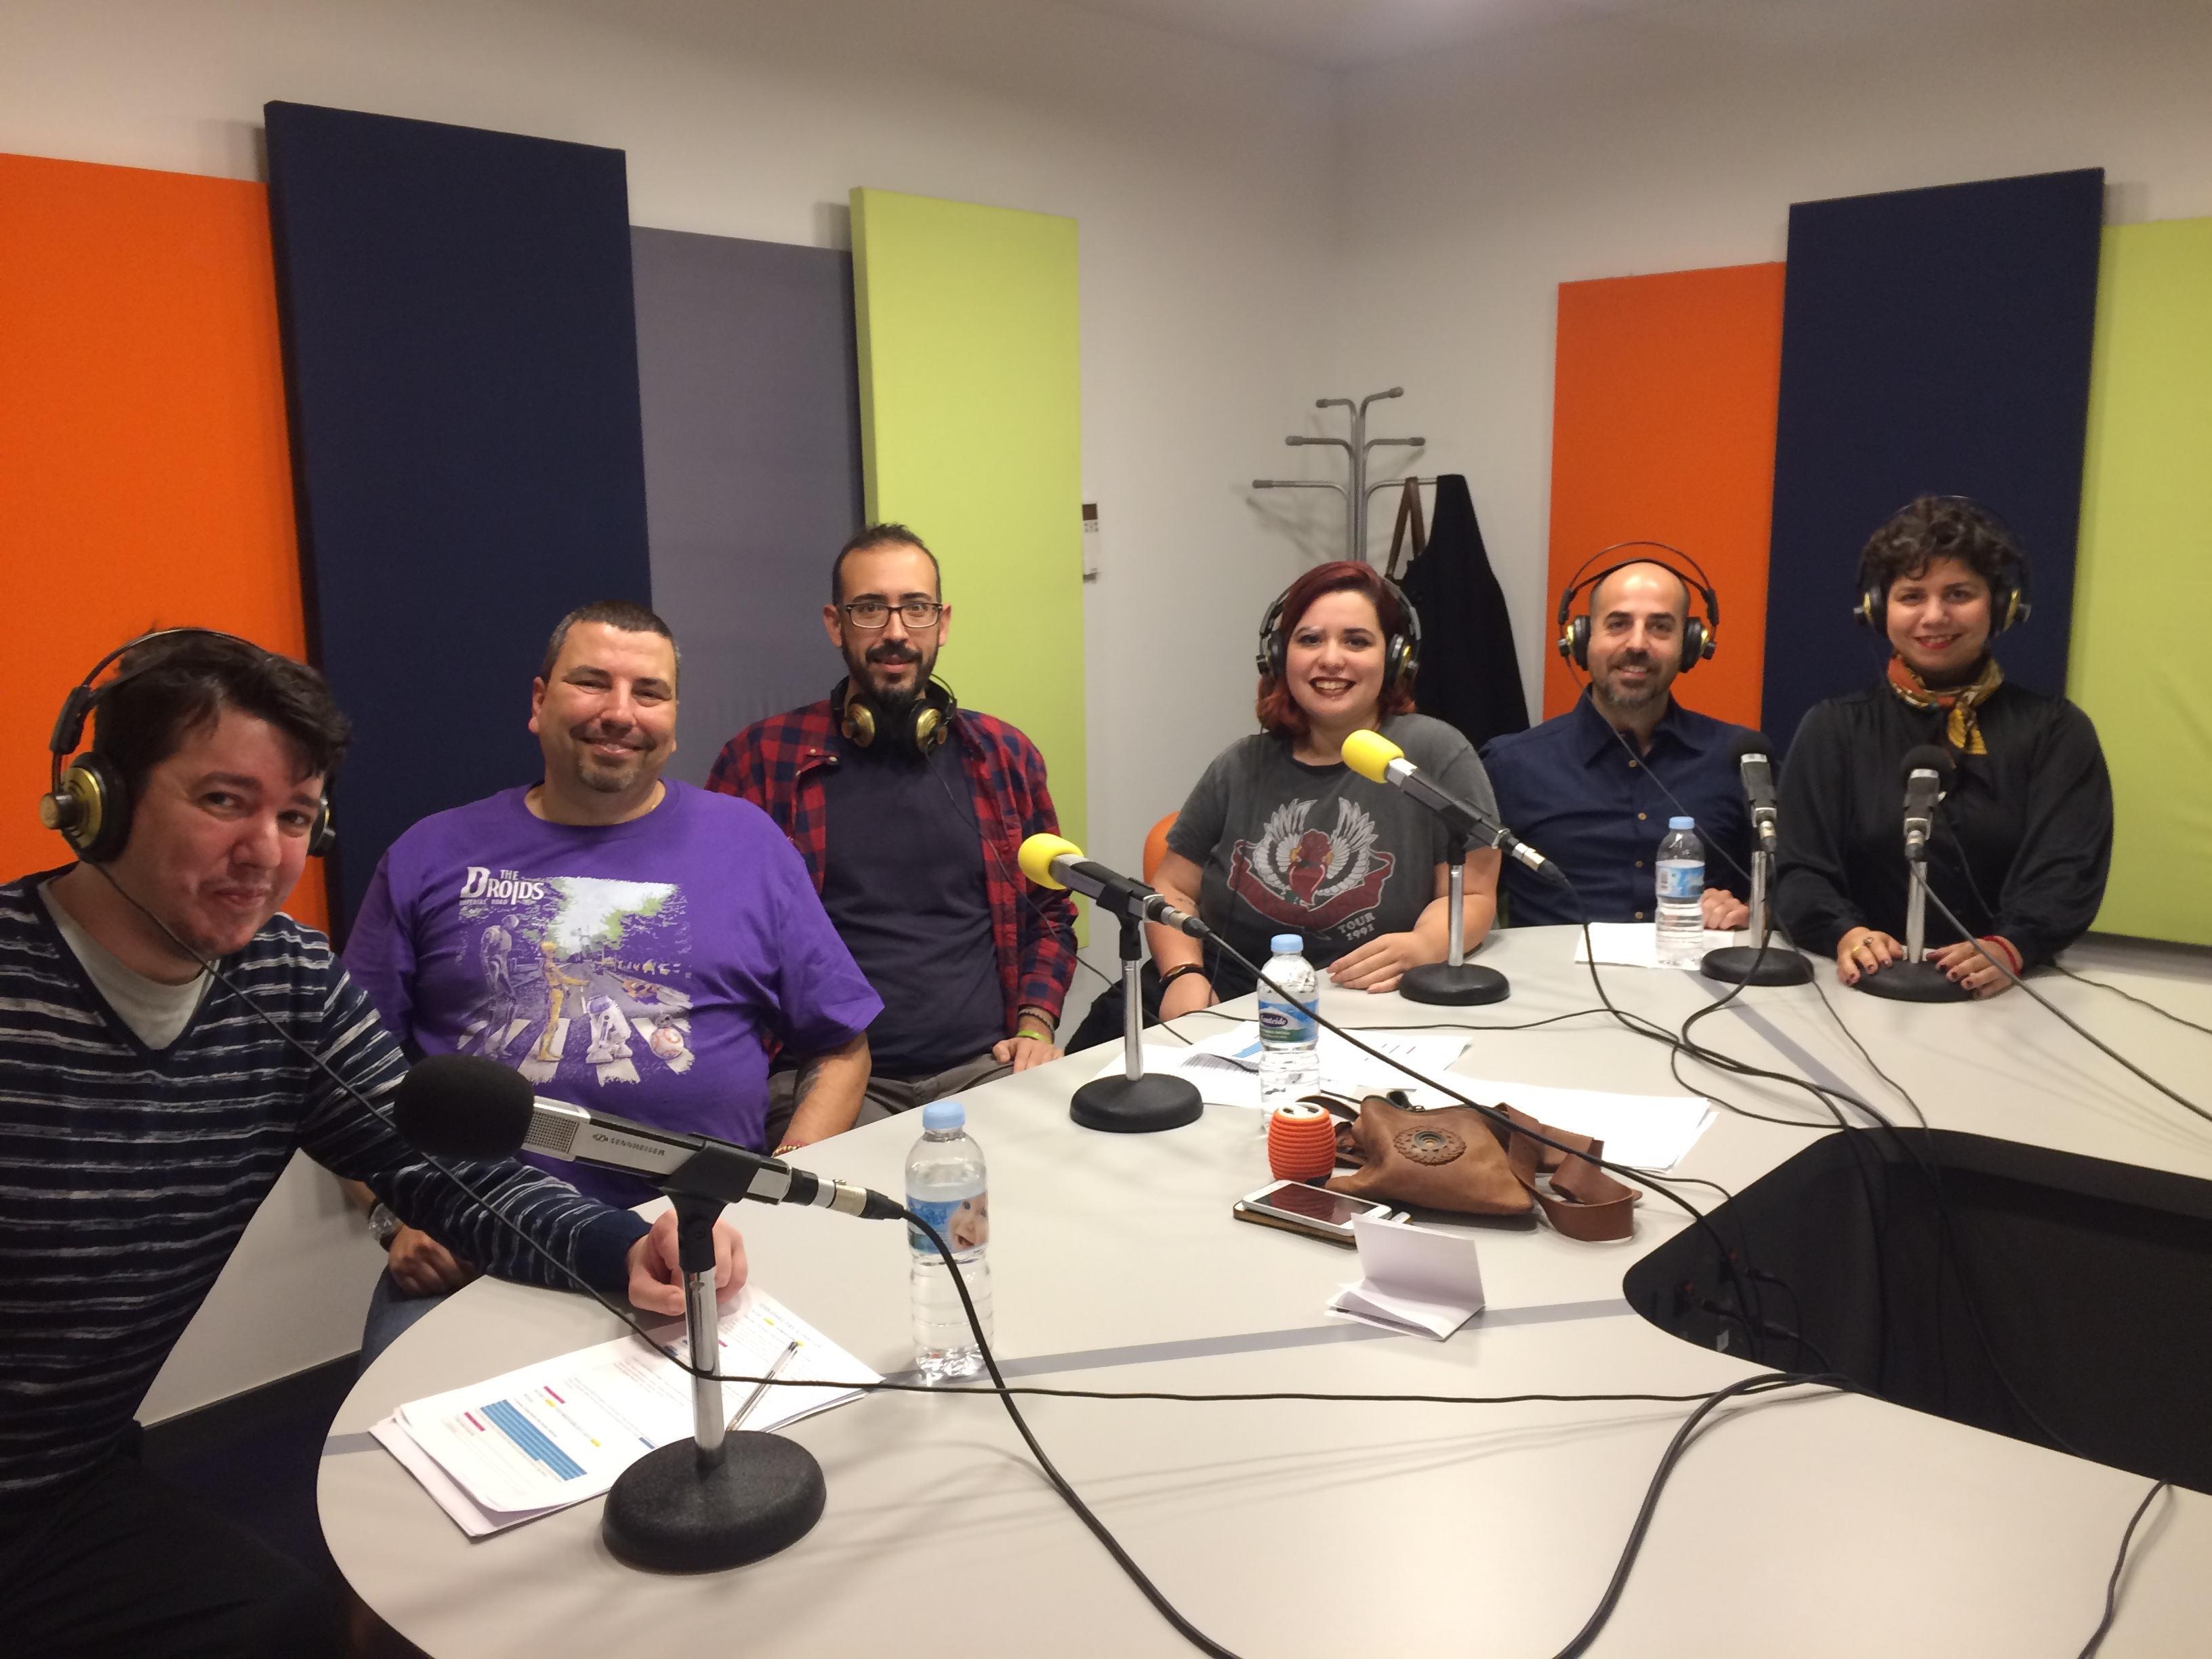 Pablo Vázquez, Jose Herrera, Enrique González, Cristina Mahelo, Javitxuela y Alejandra Galo